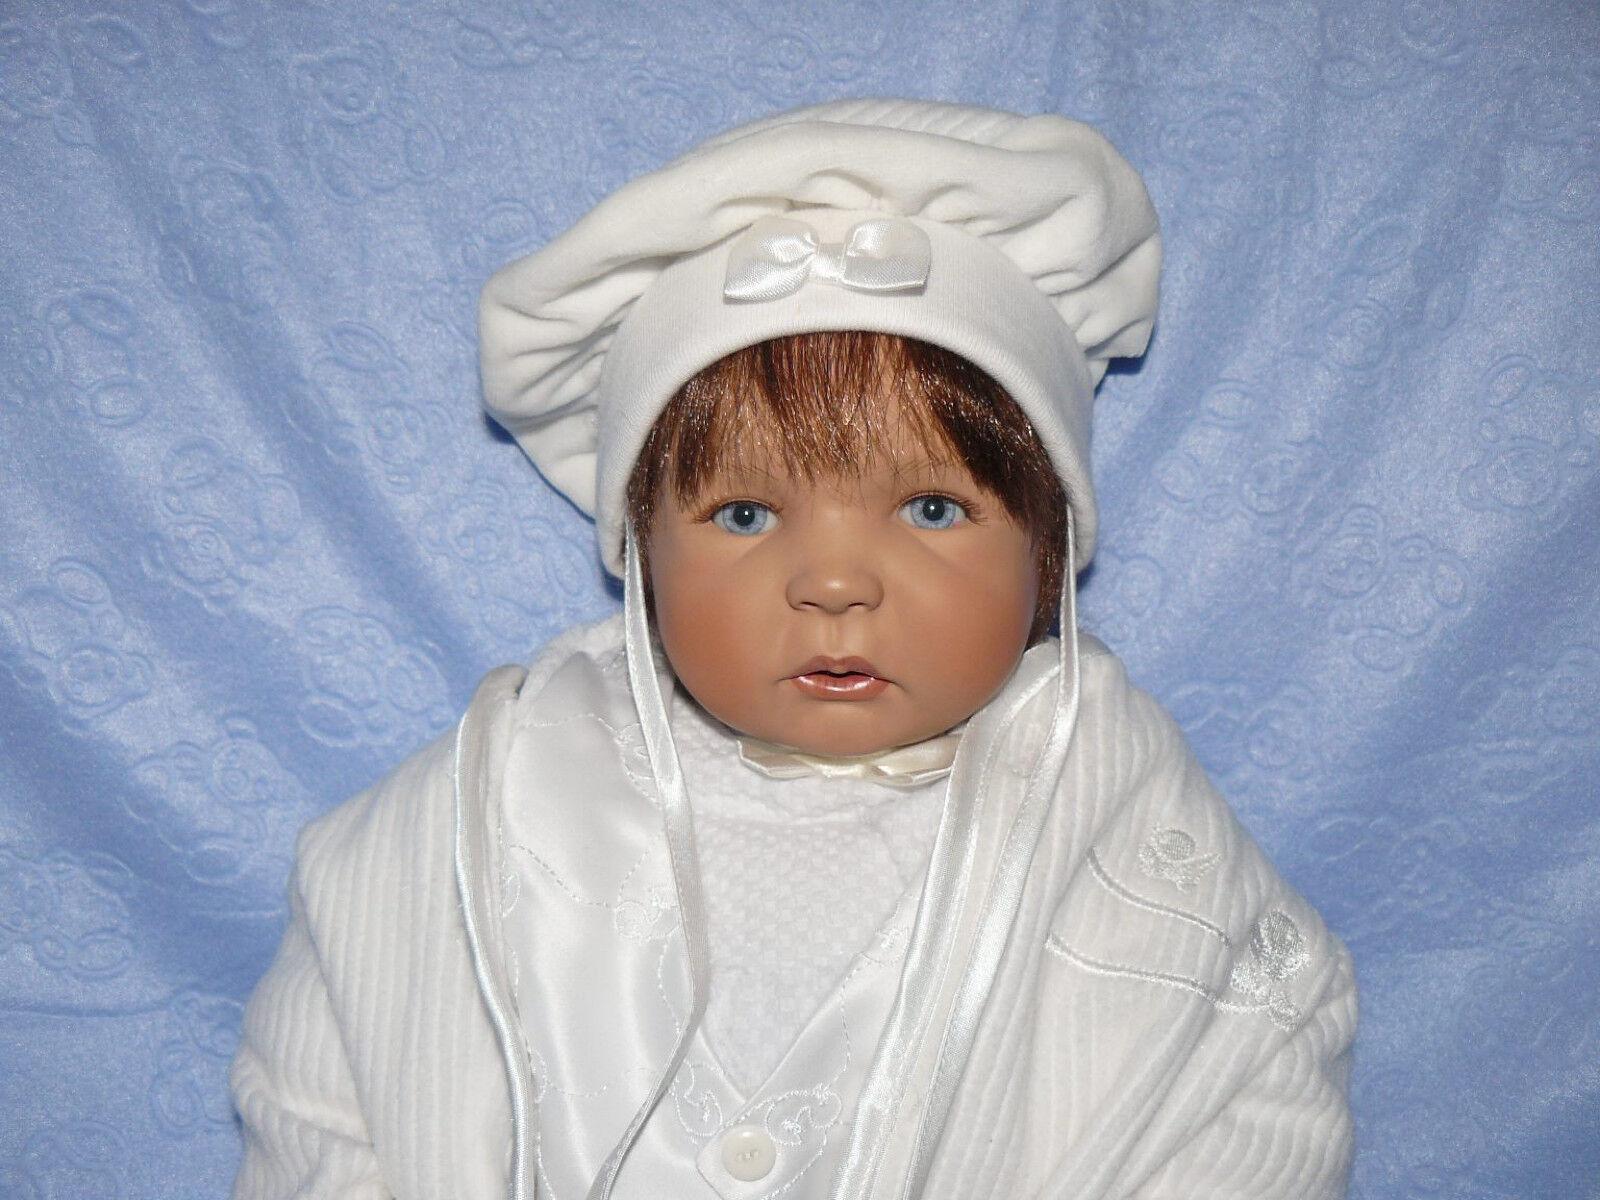 Doris stannat Luca muñeca artistas muñecas muñecas de porcelana